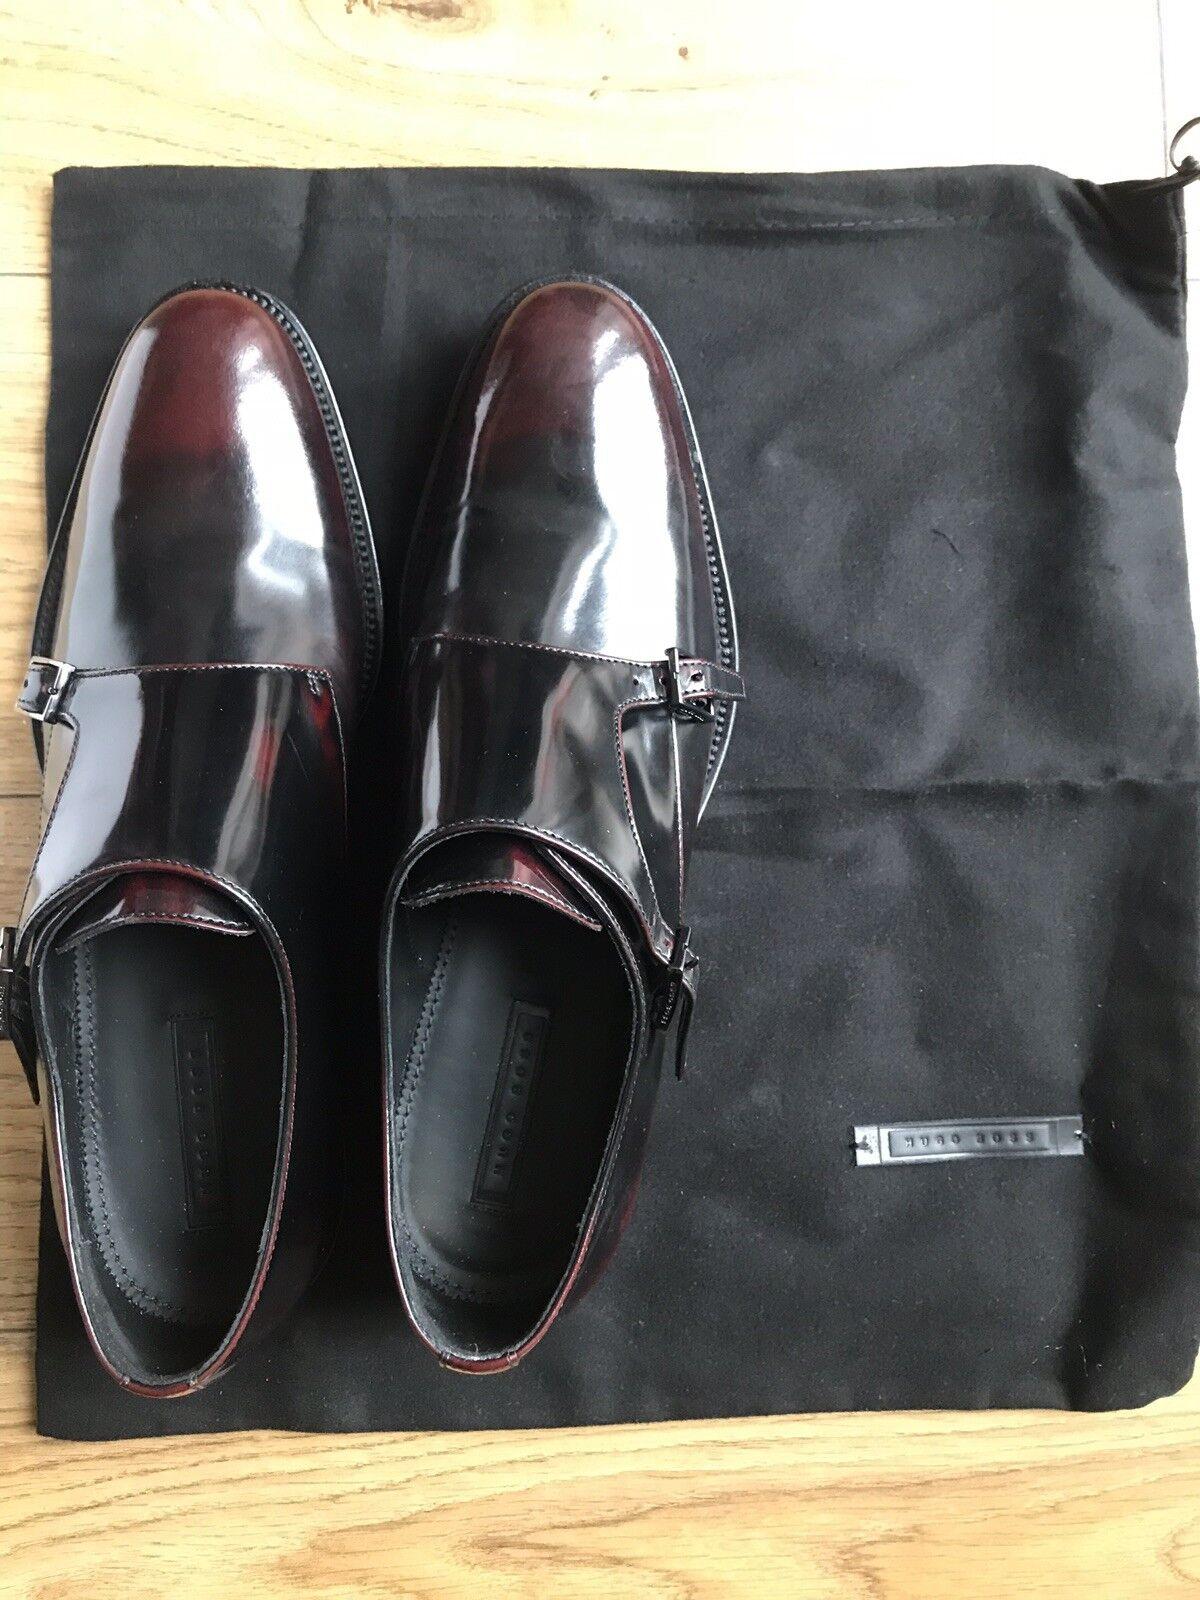 Size 8 Hugo Boss shoes for Women